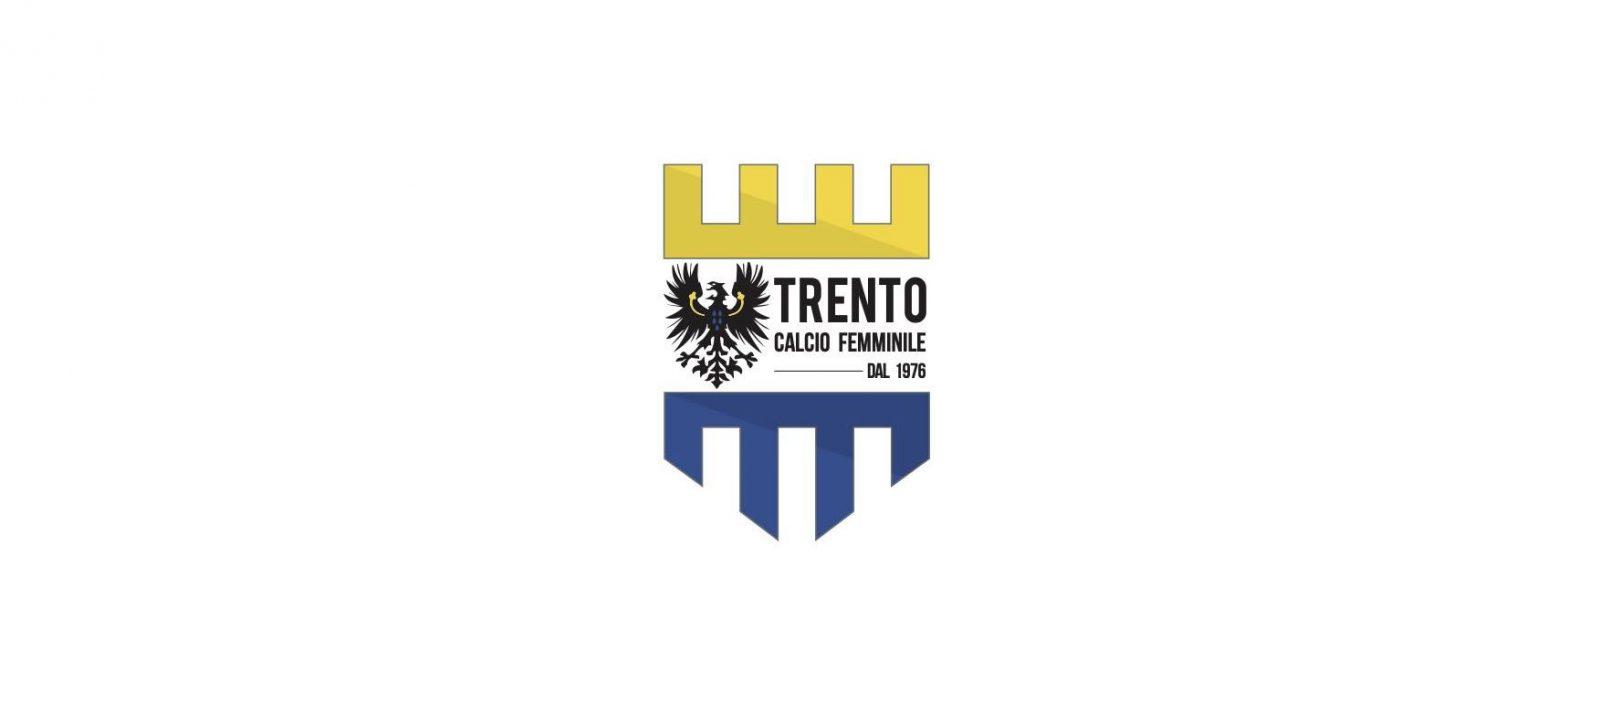 Restyling logo Acf Trento calcio femminile